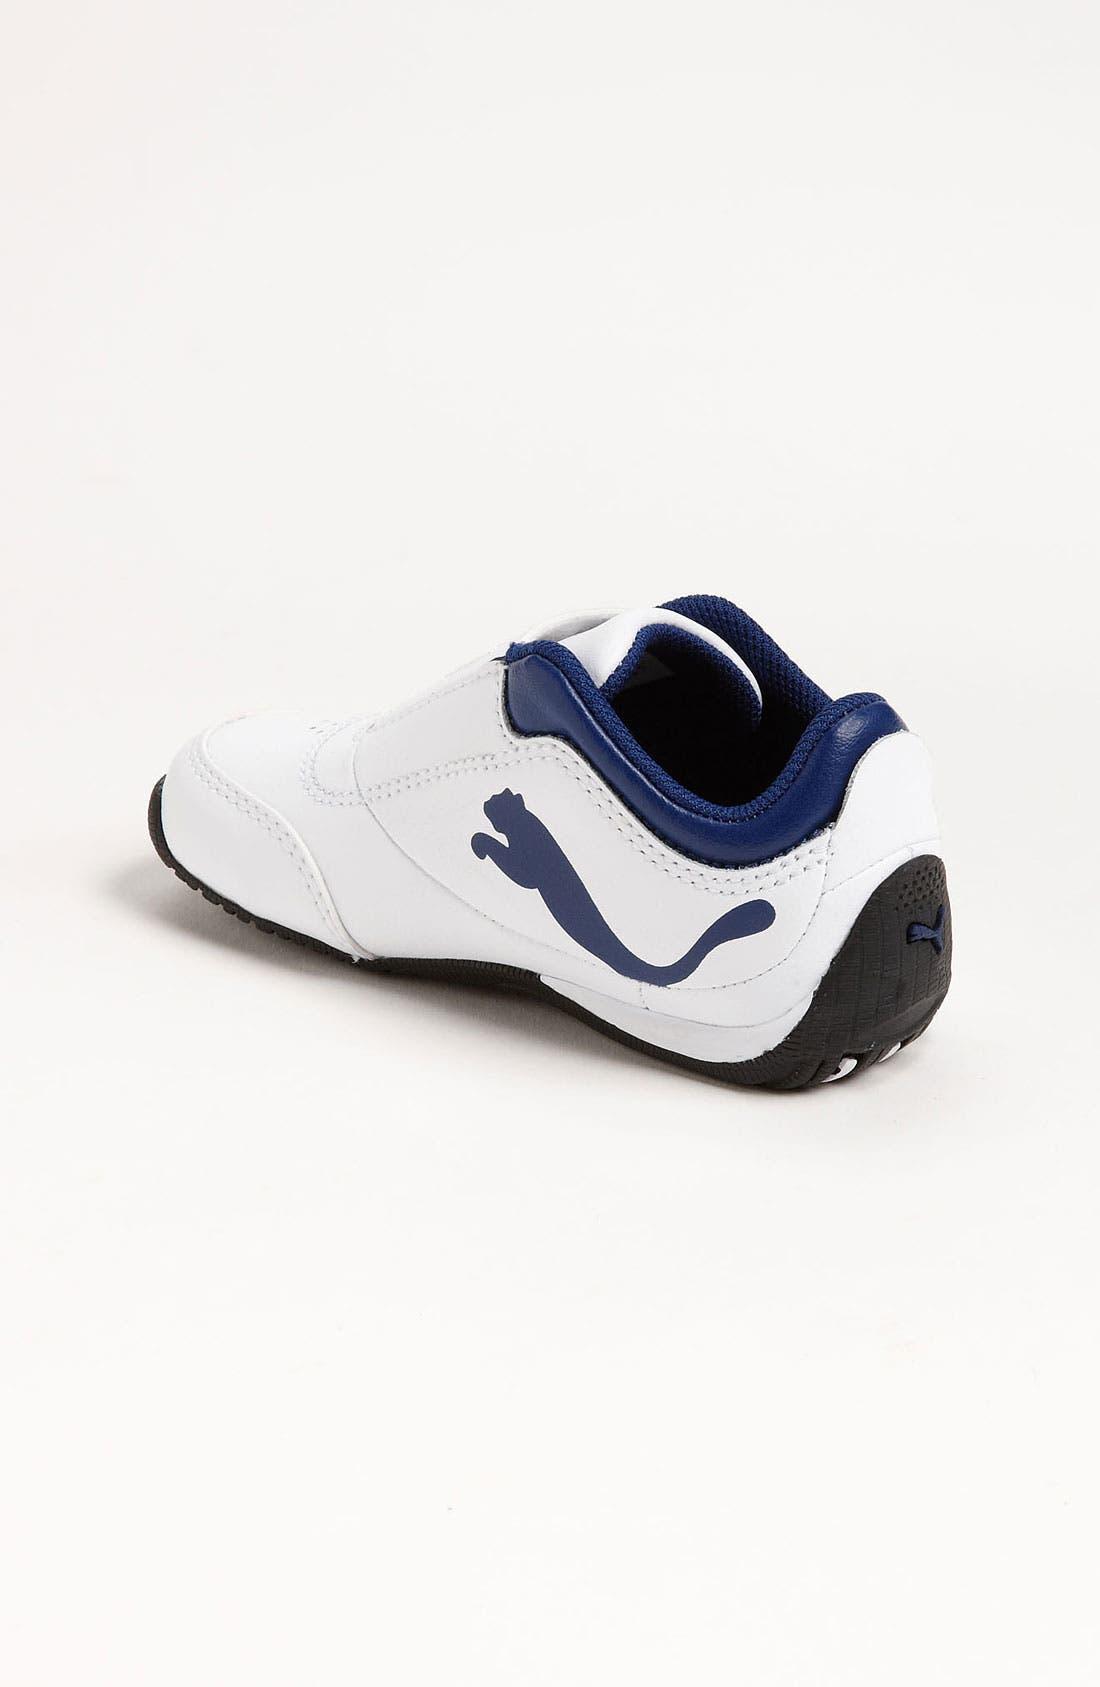 Alternate Image 2  - PUMA 'Drift Cat 4' Sneaker (Baby, Walker, Toddler, Little Kid & Big Kid)